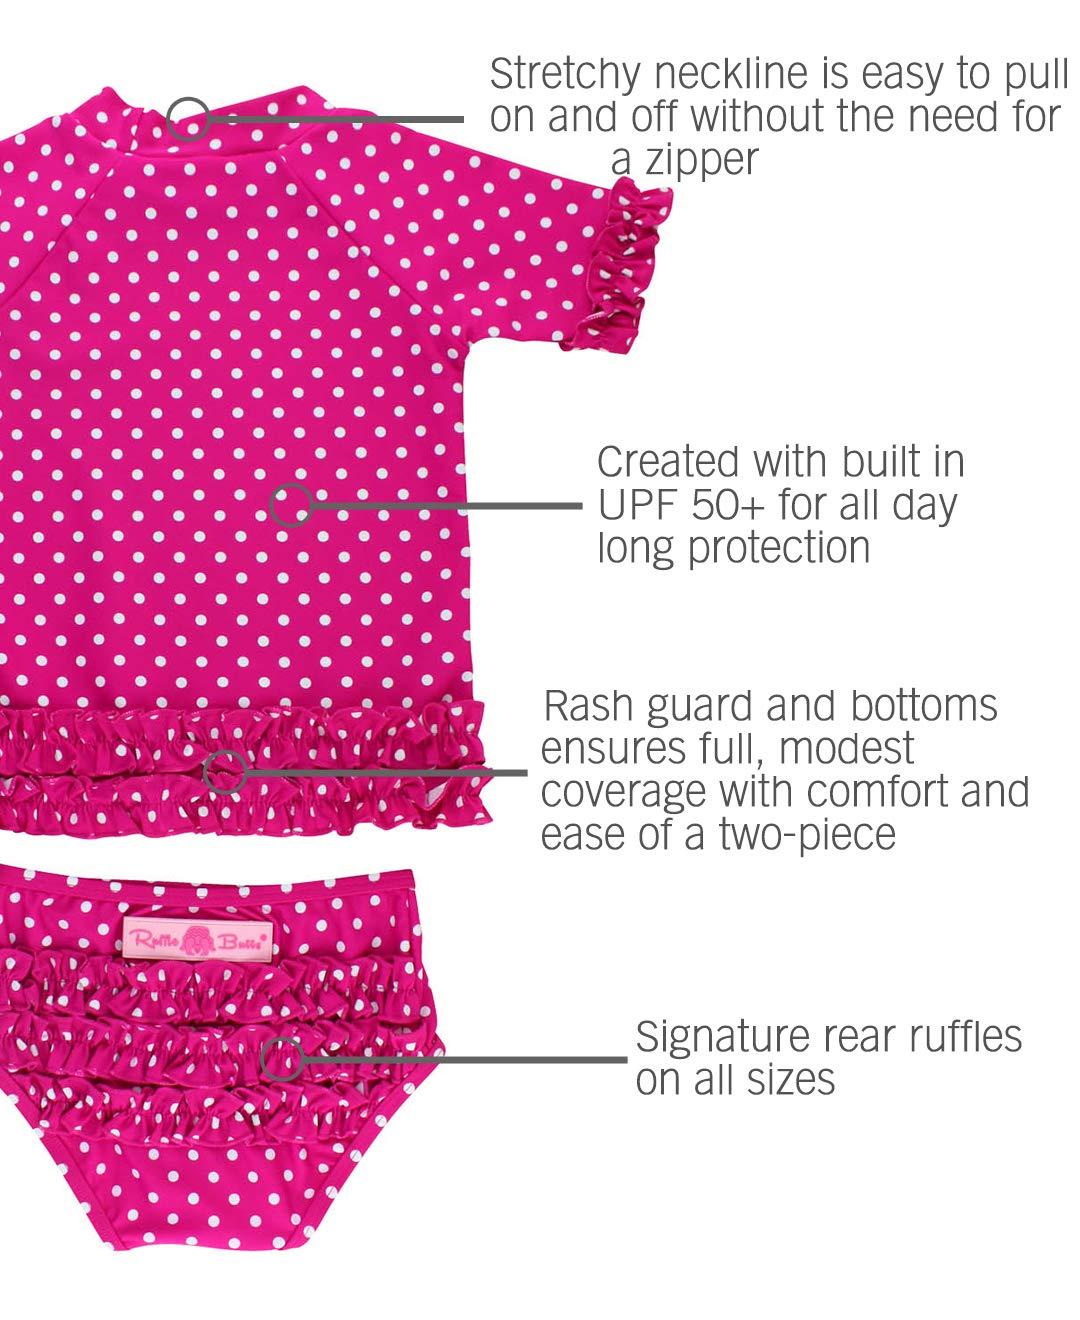 RuffleButts Little Girls Rash Guard 2-Piece Swimsuit Set - Berry Polka Dot Bikini with UPF 50+ Sun Protection - 3T by RuffleButts (Image #4)